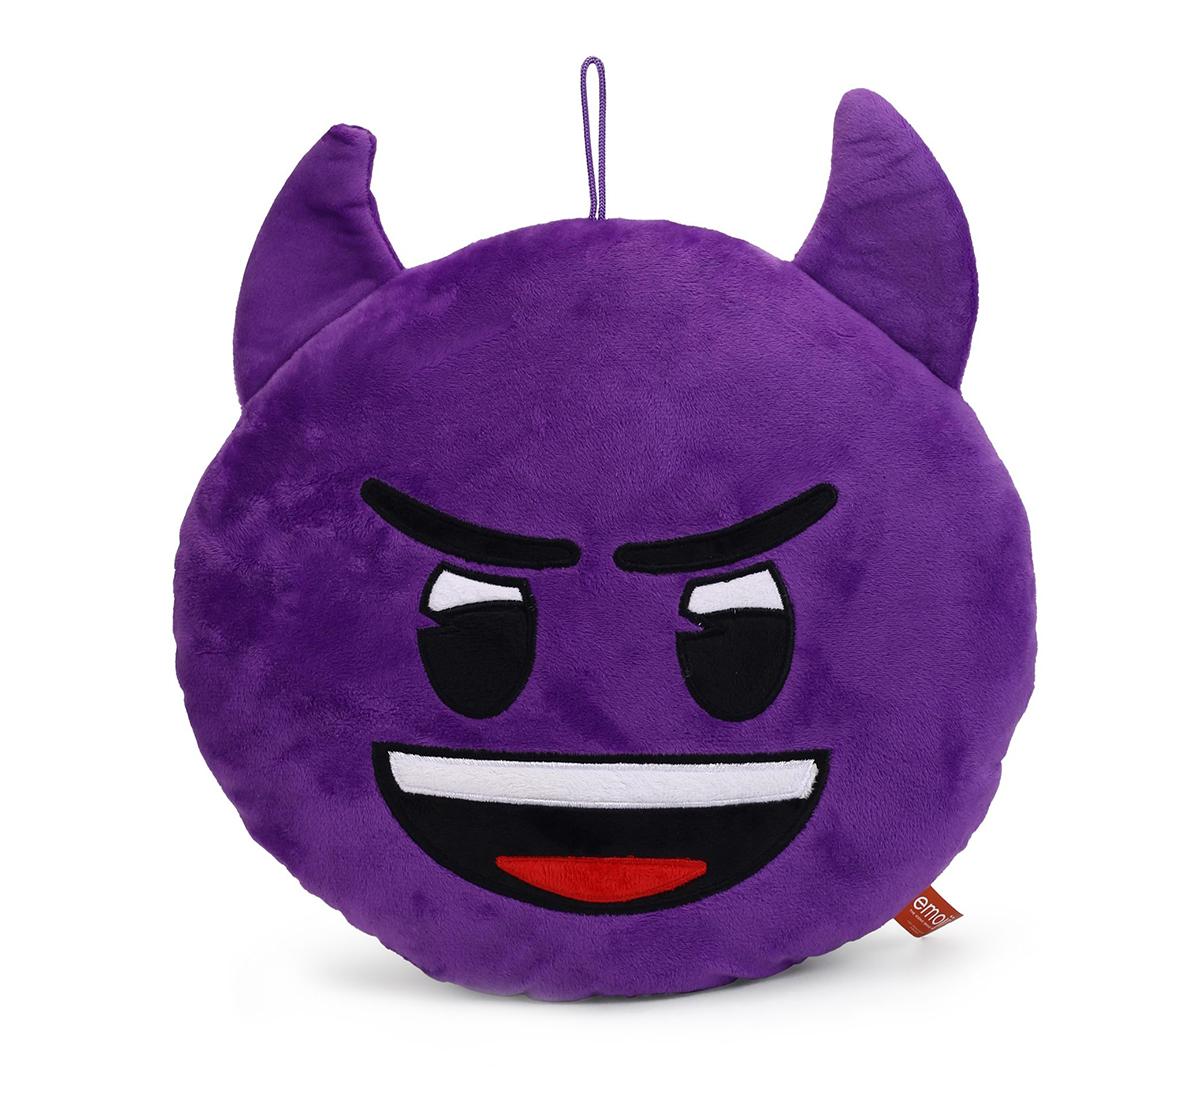 Emoji | My Baby Excel Emoji  Devil Face 30 Cm Plush Accessories for Kids age 1Y+ (Purple)